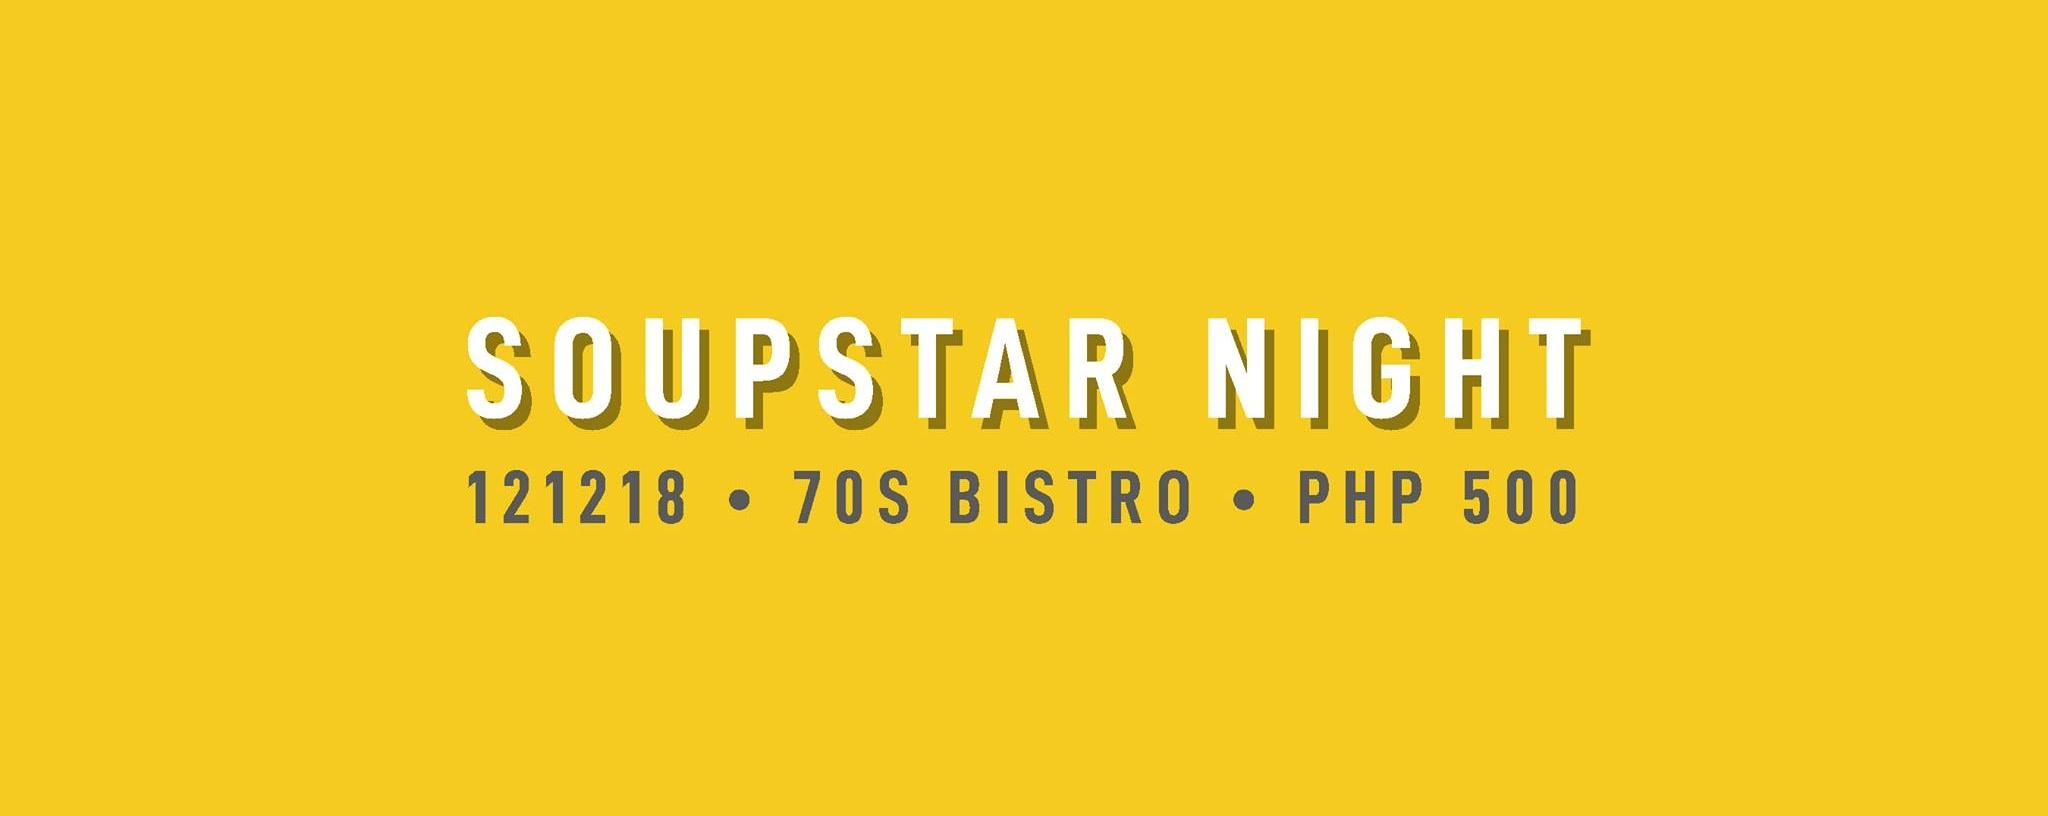 Soupstar Night